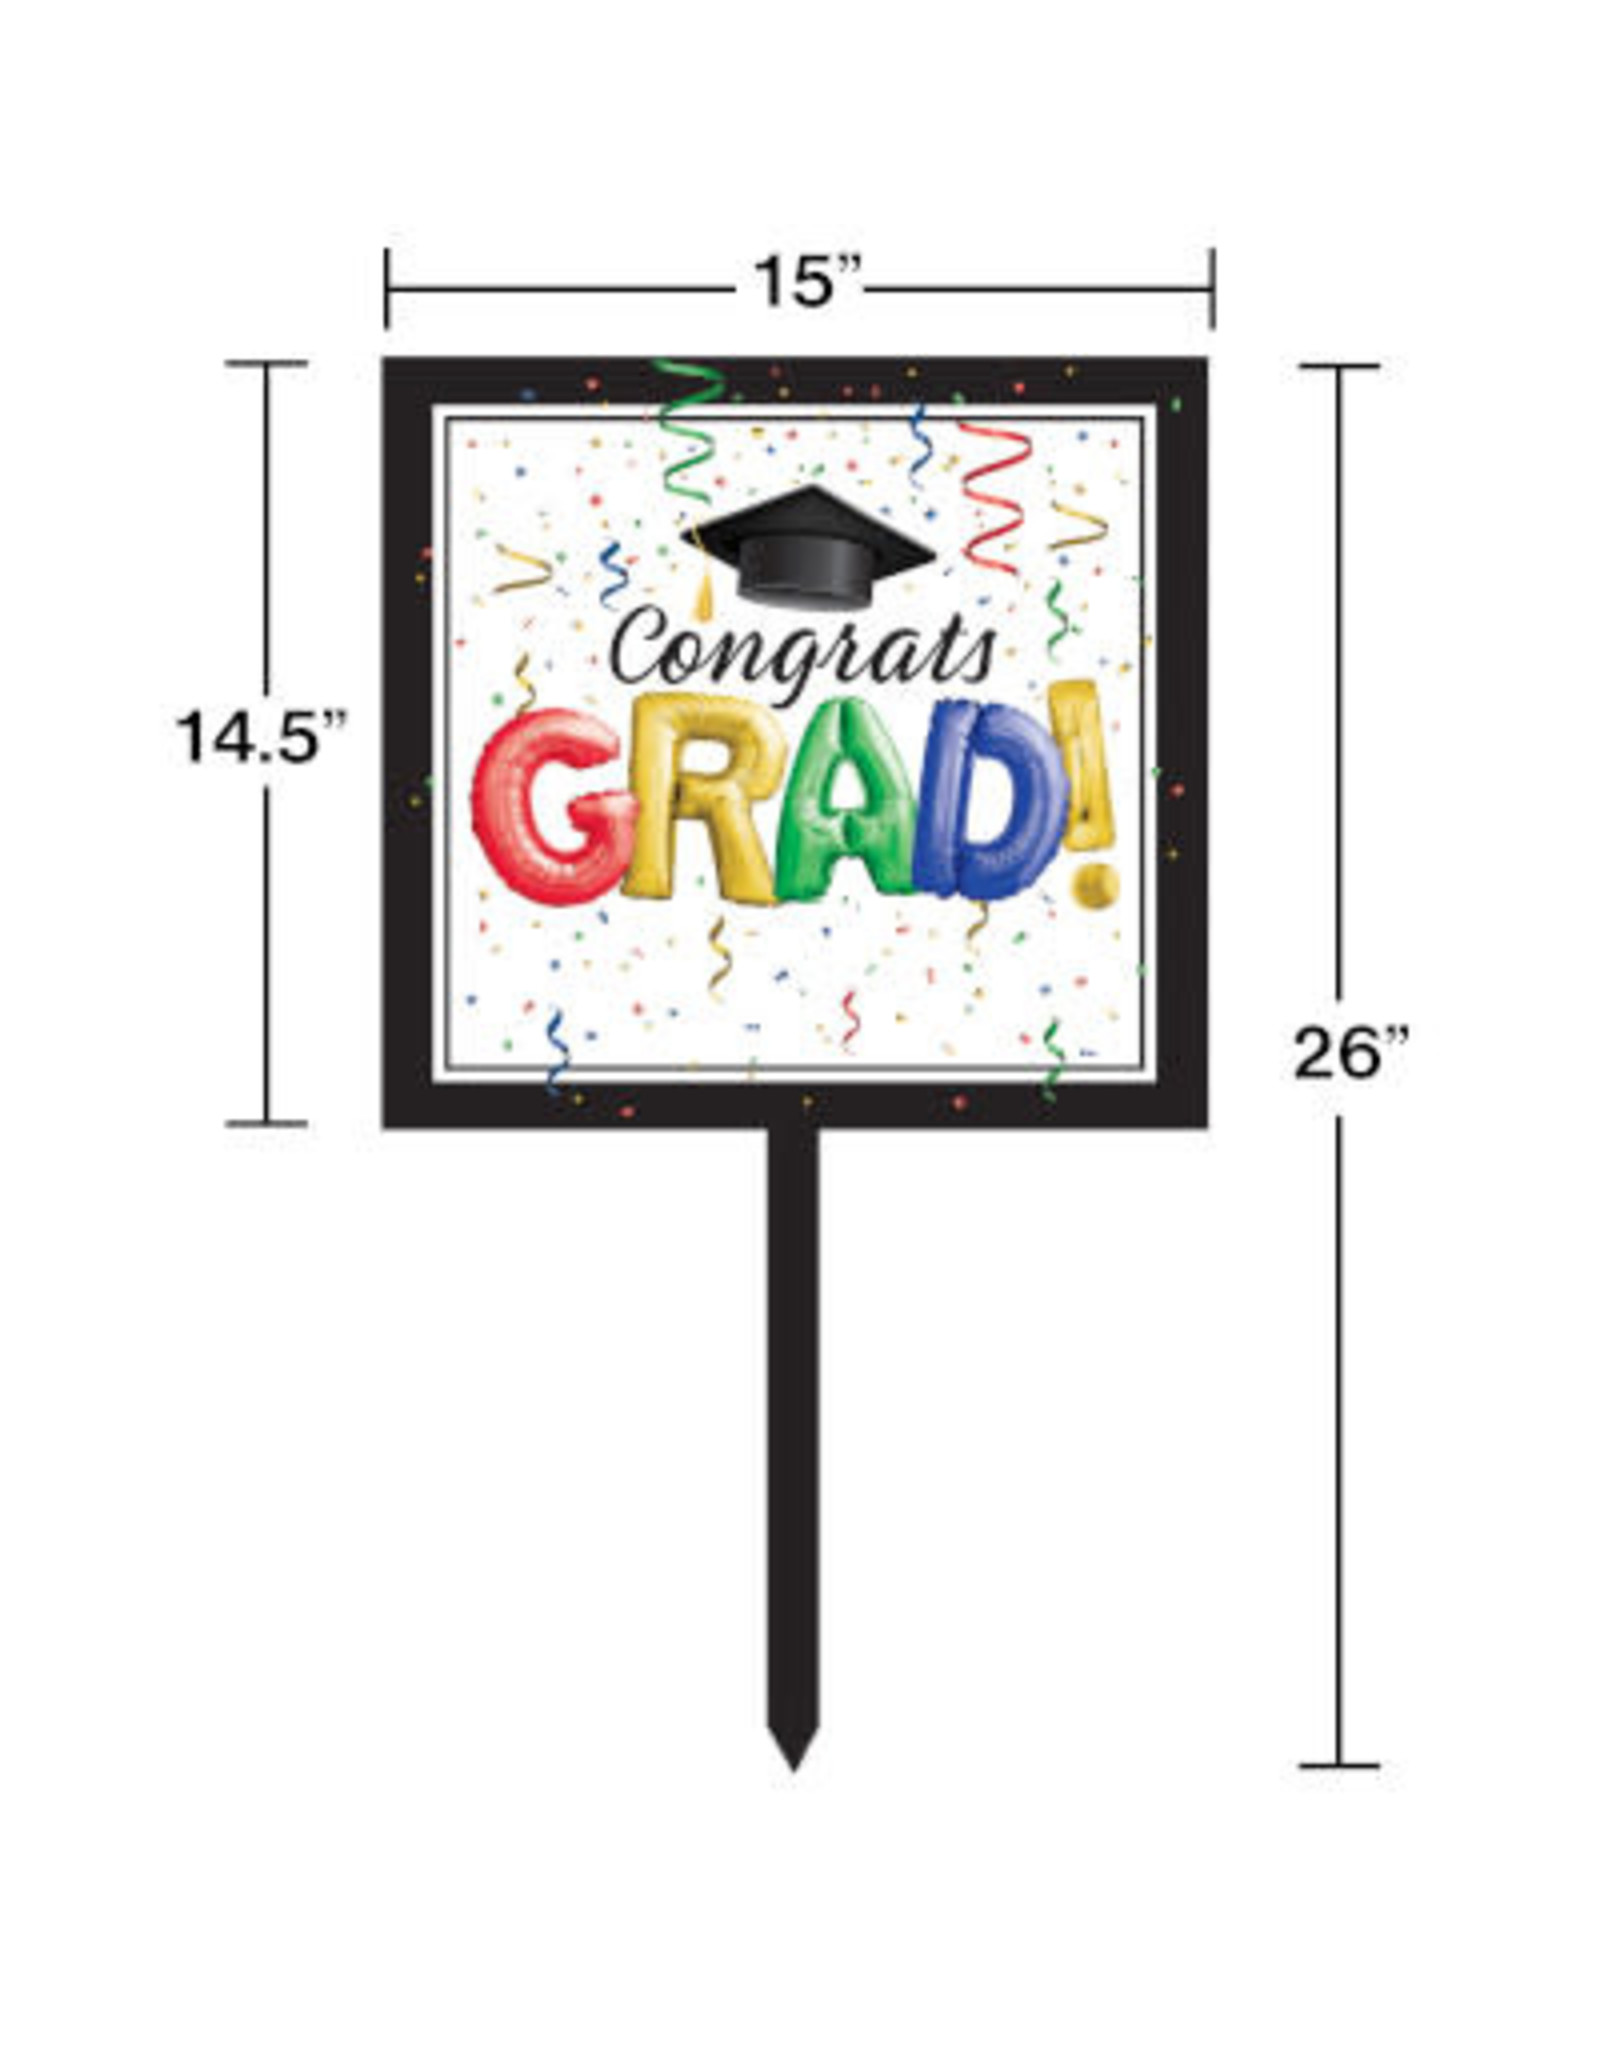 creative converting #1 Grad Lawn Sign